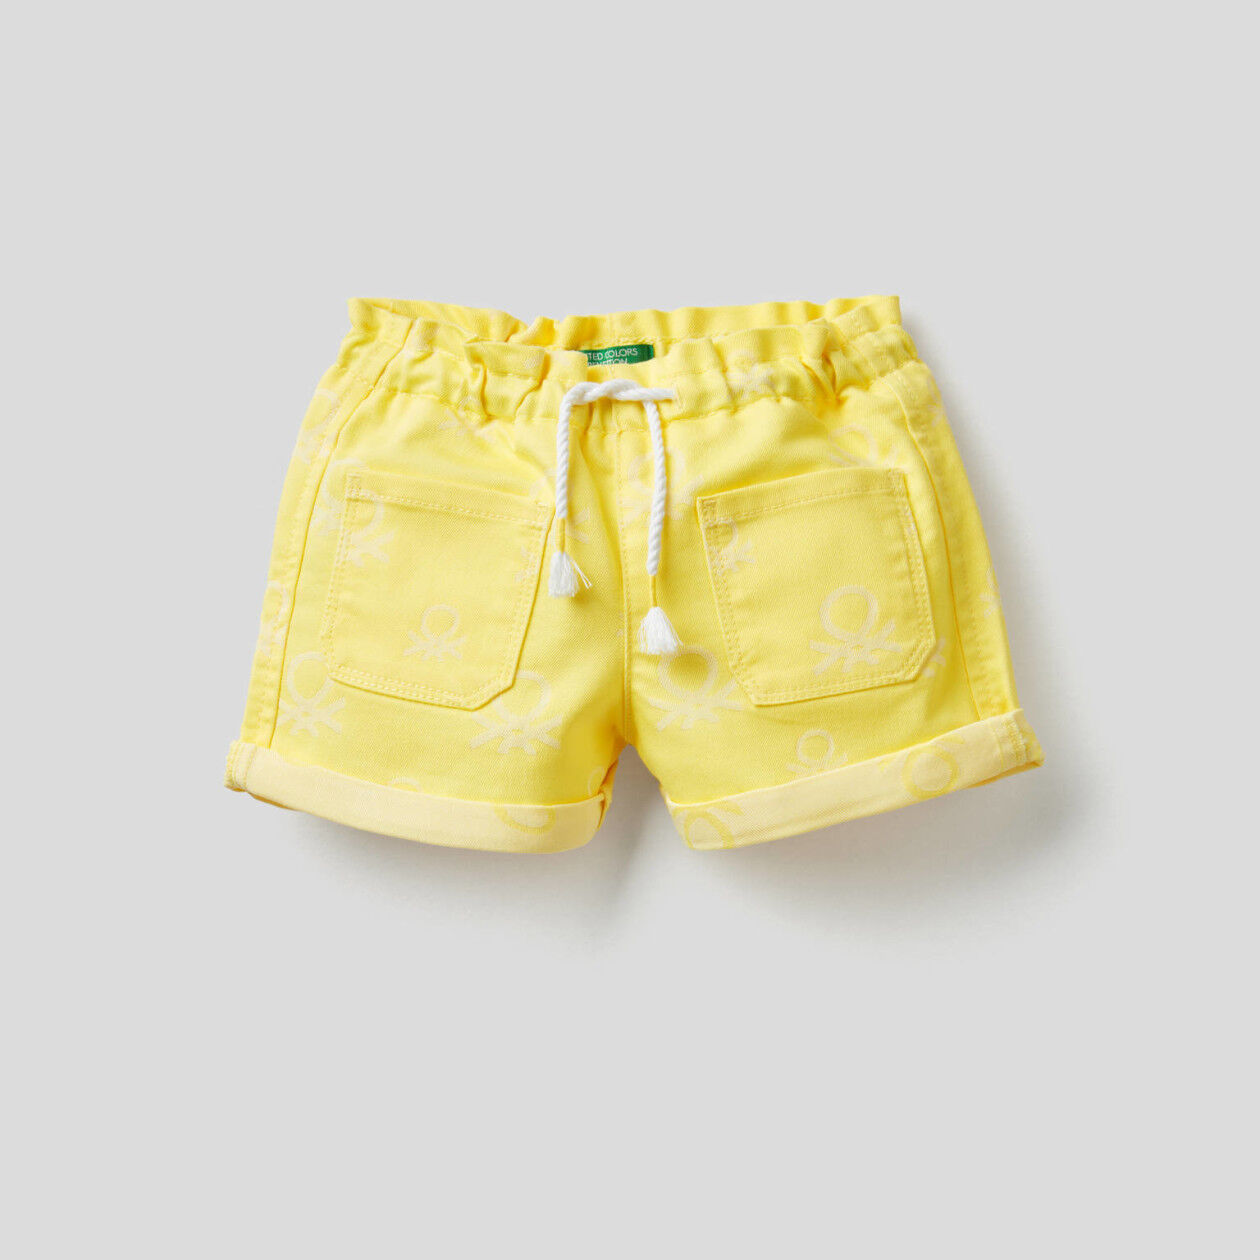 Pantalón corto en denim con logotipo